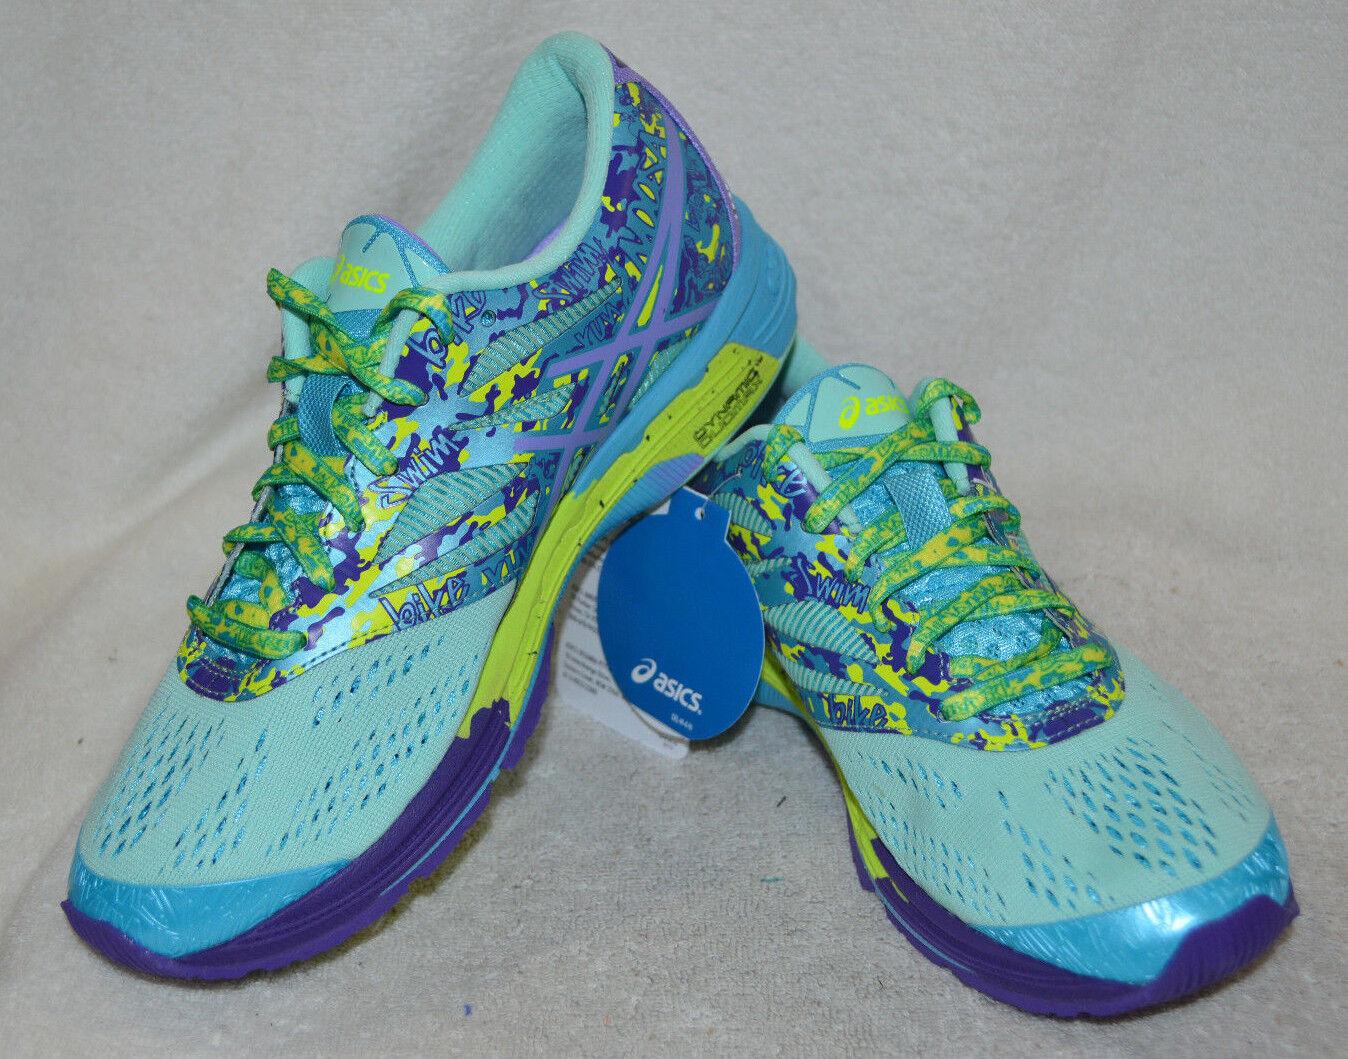 ASICS GEL-Noosa Tri 10 Mint/Lavender/Turq Femme Running Chaussures -